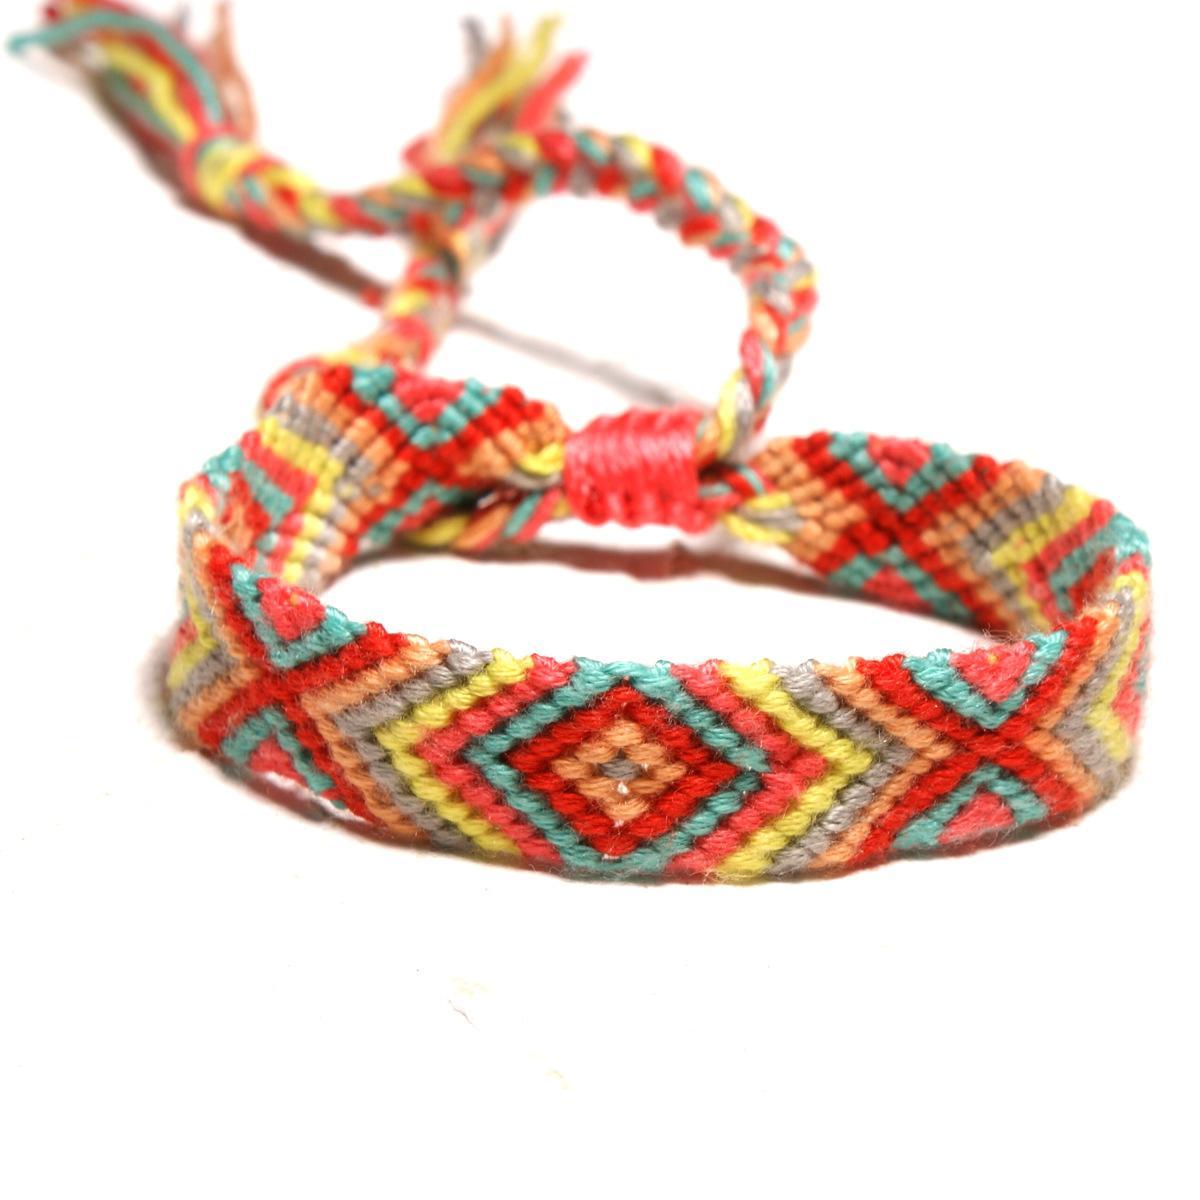 Macrame Handmade Craft Rainbow Bracelets Lucky Gift for Friendship Bracelets Knot Macrame Designer Popular Bohemian Style Charm Bracelet